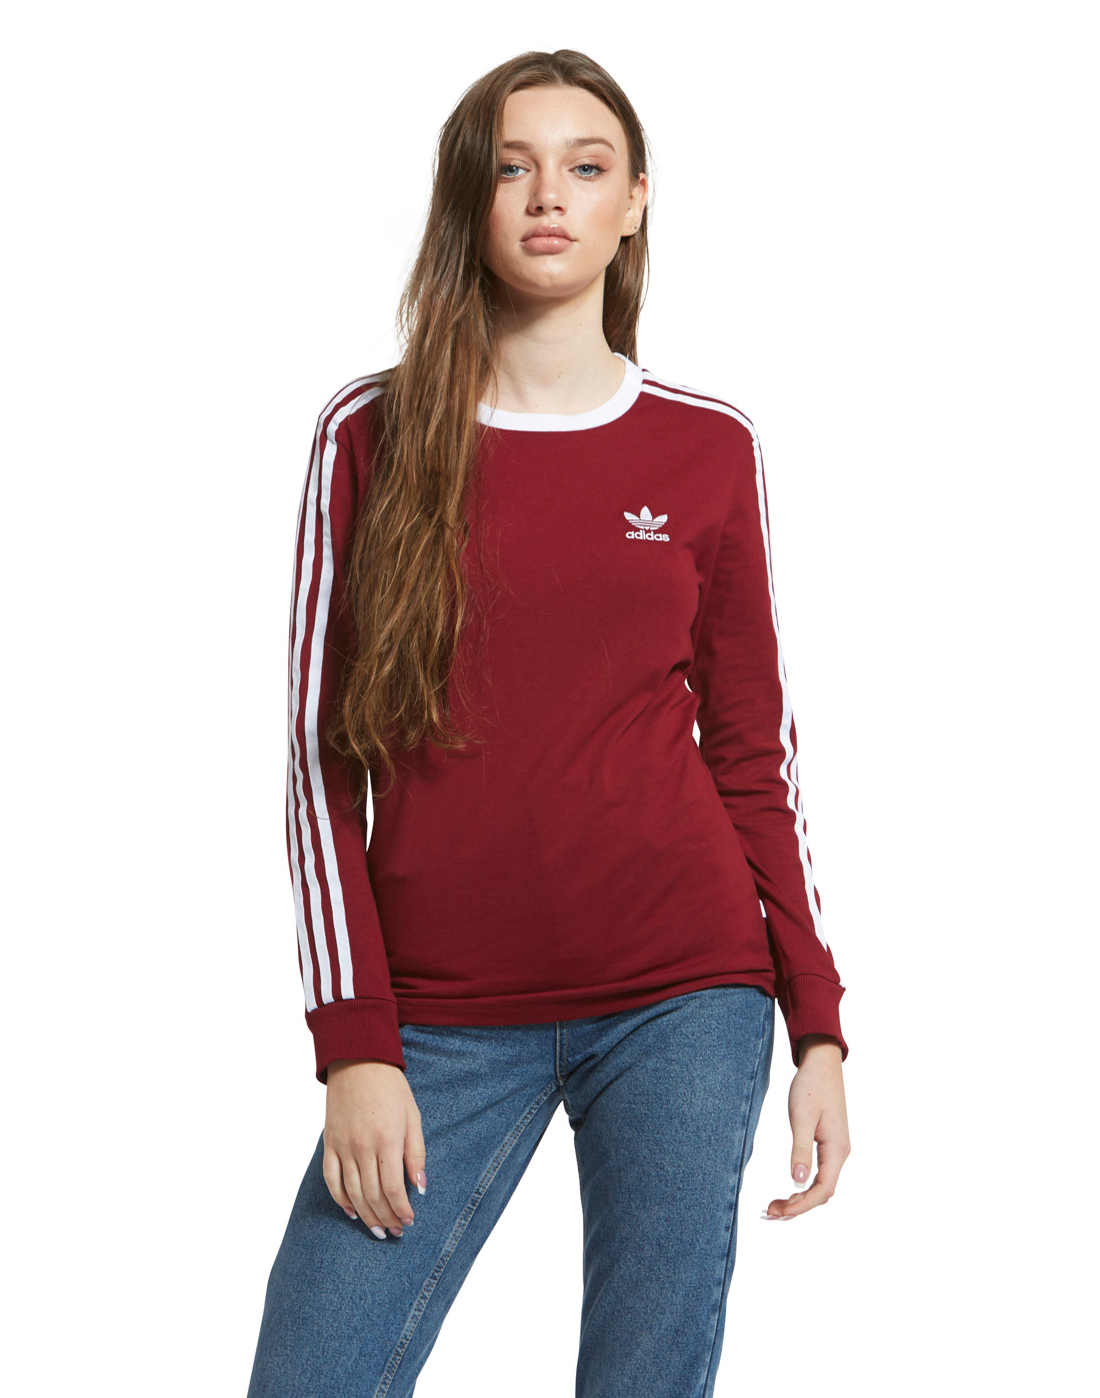 bde3eceb2b8 adidas Originals Womens 3 Stripe Long Sleeve T-Shirt | Life Style Sports